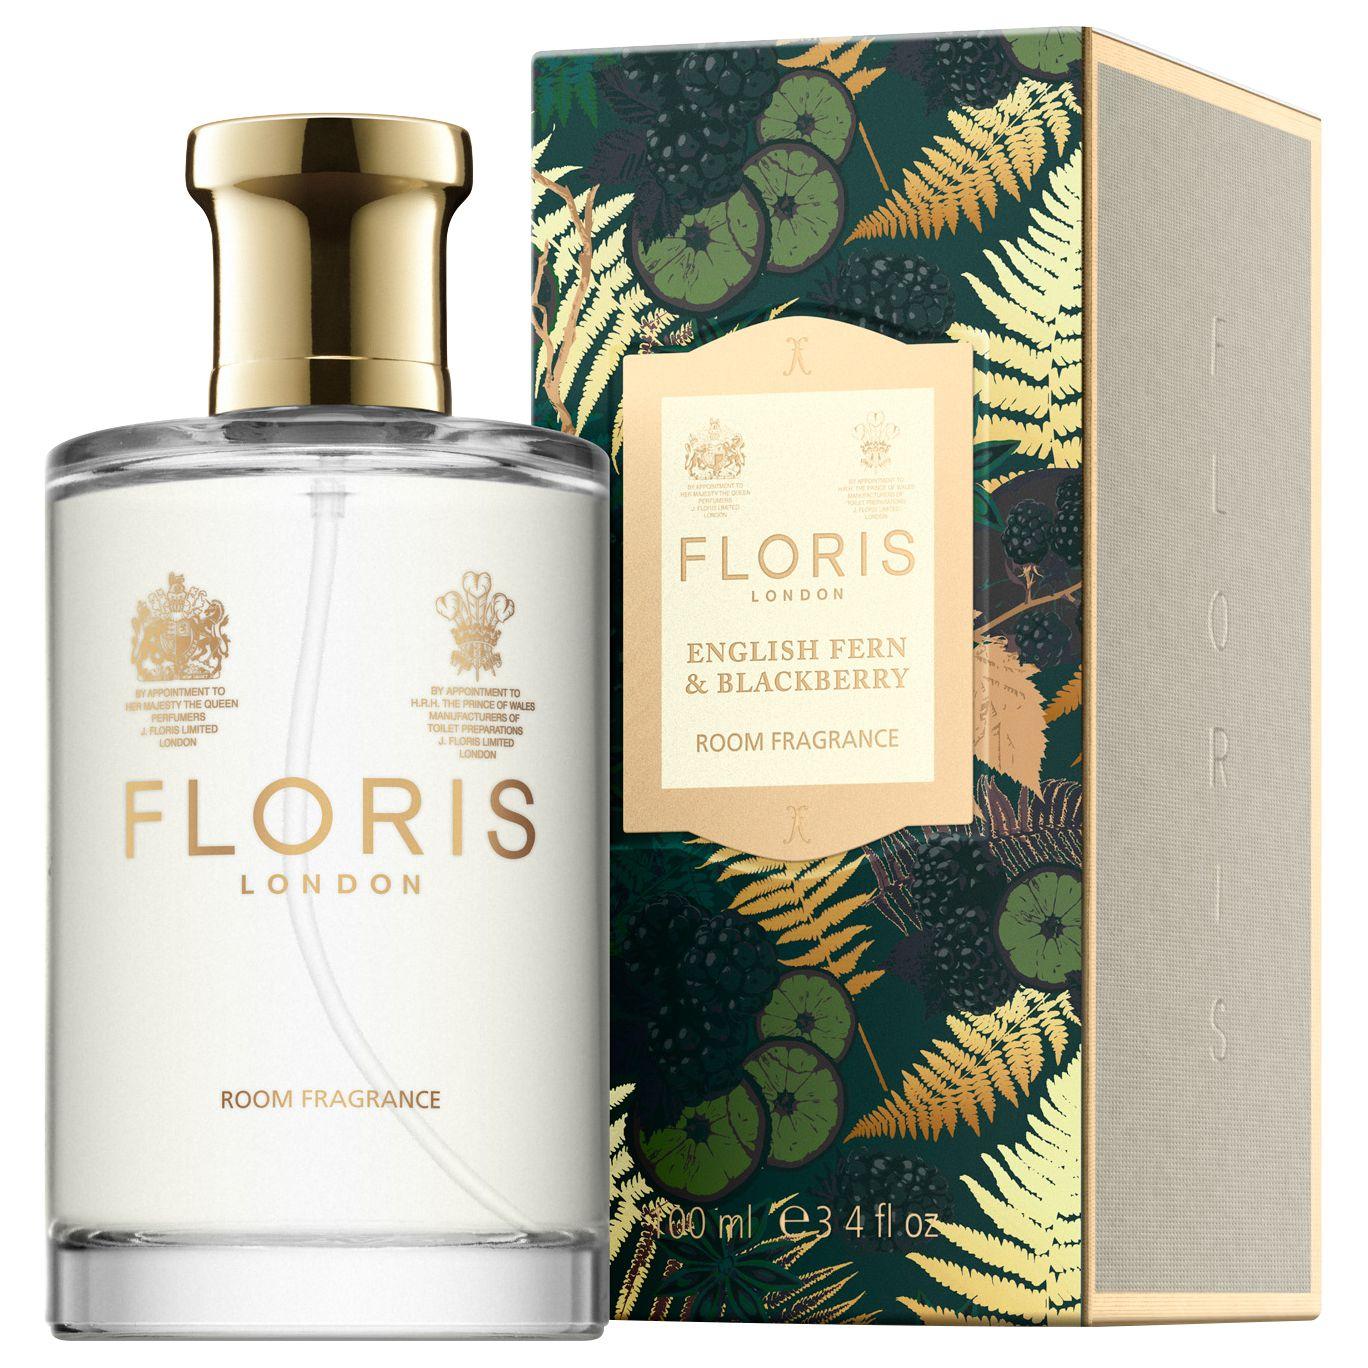 Floris Floris English Fern & Blackberry Room Fragrance, 100ml